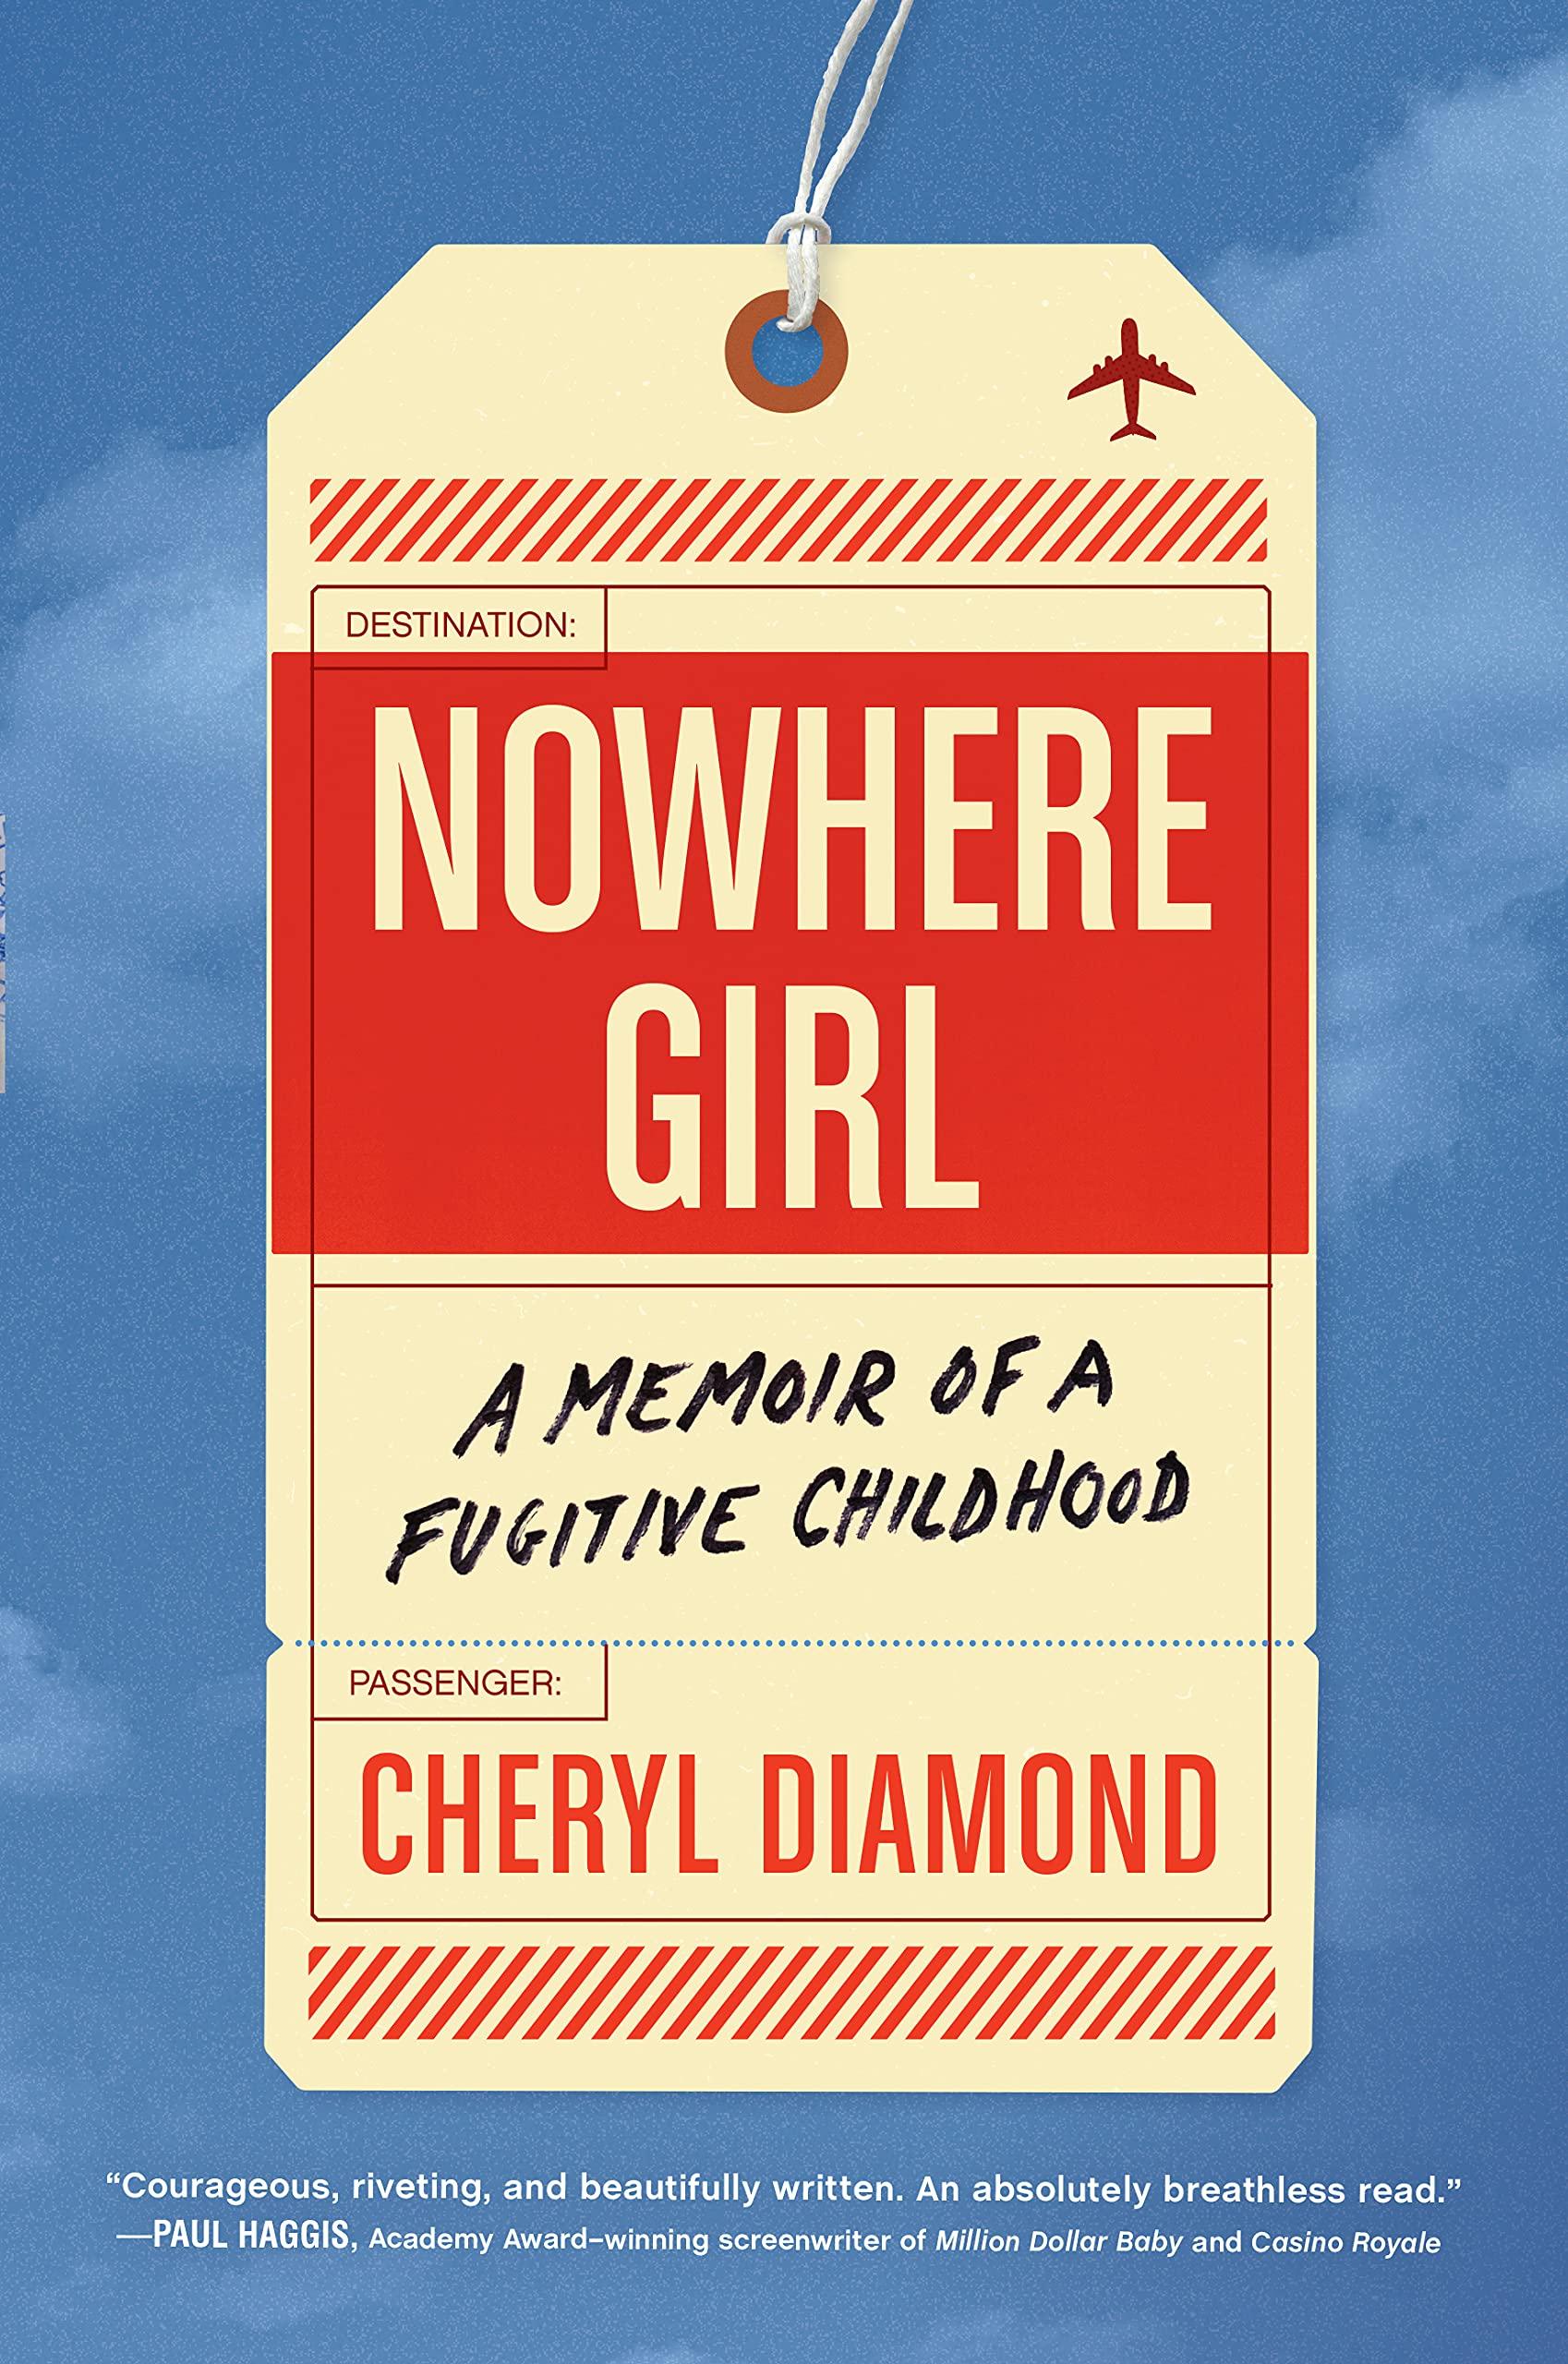 Amazon.com: Nowhere Girl: A Memoir of a Fugitive Childhood (9781616208202):  Diamond, Cheryl: Books